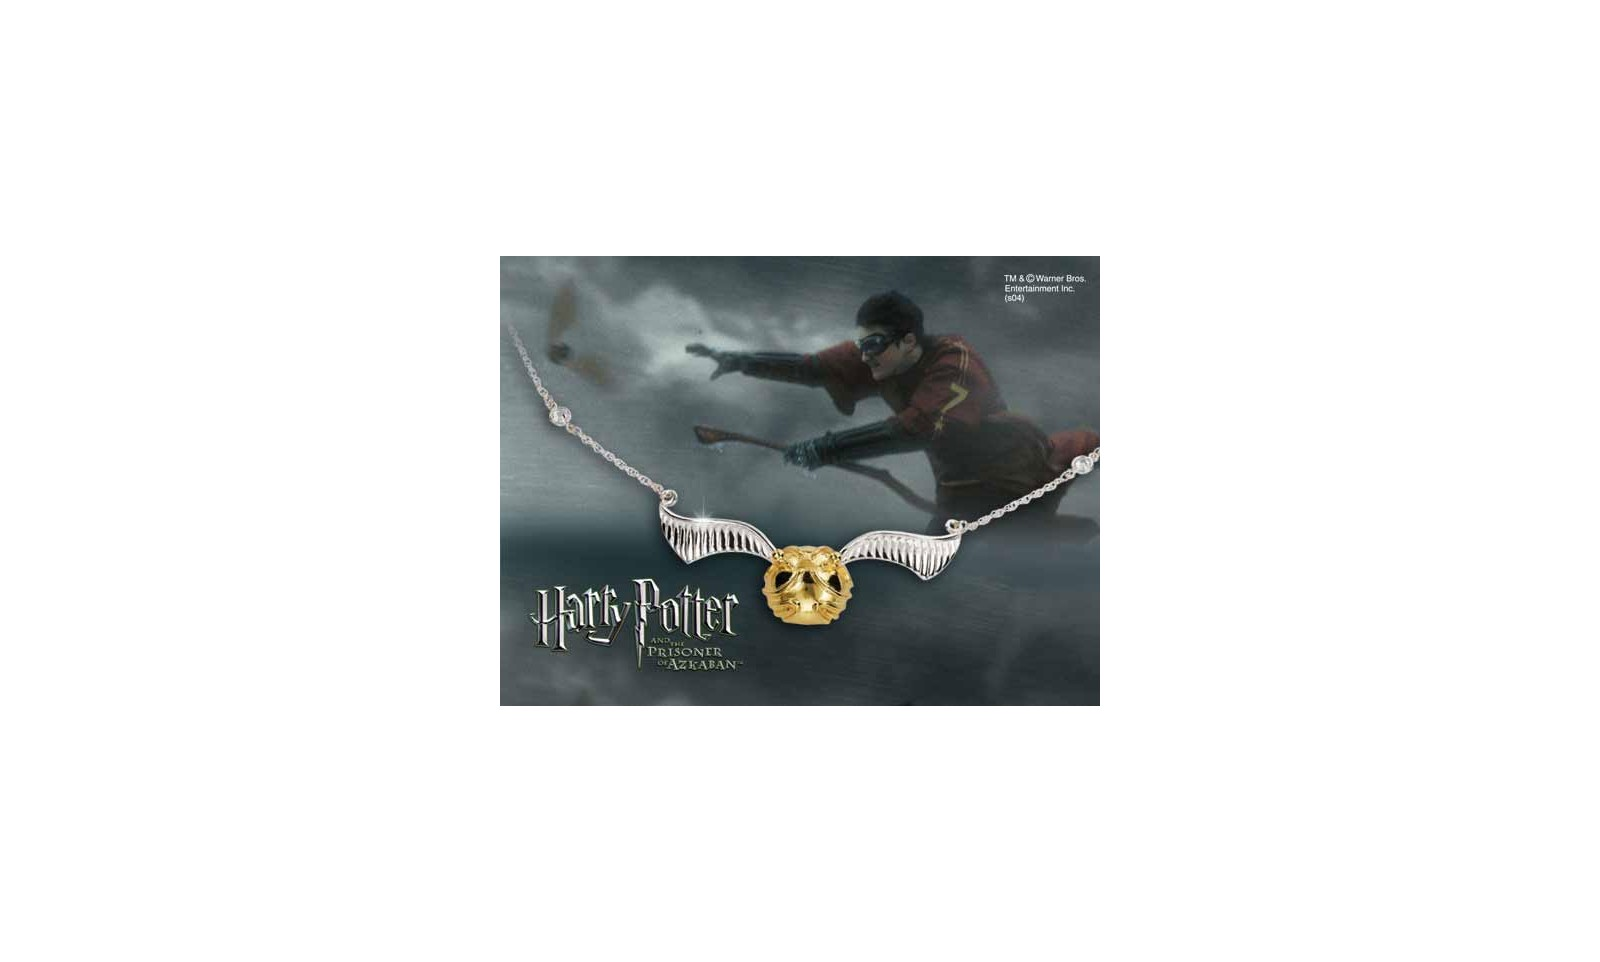 Harry Potter Jewelry Box Ivoiregion